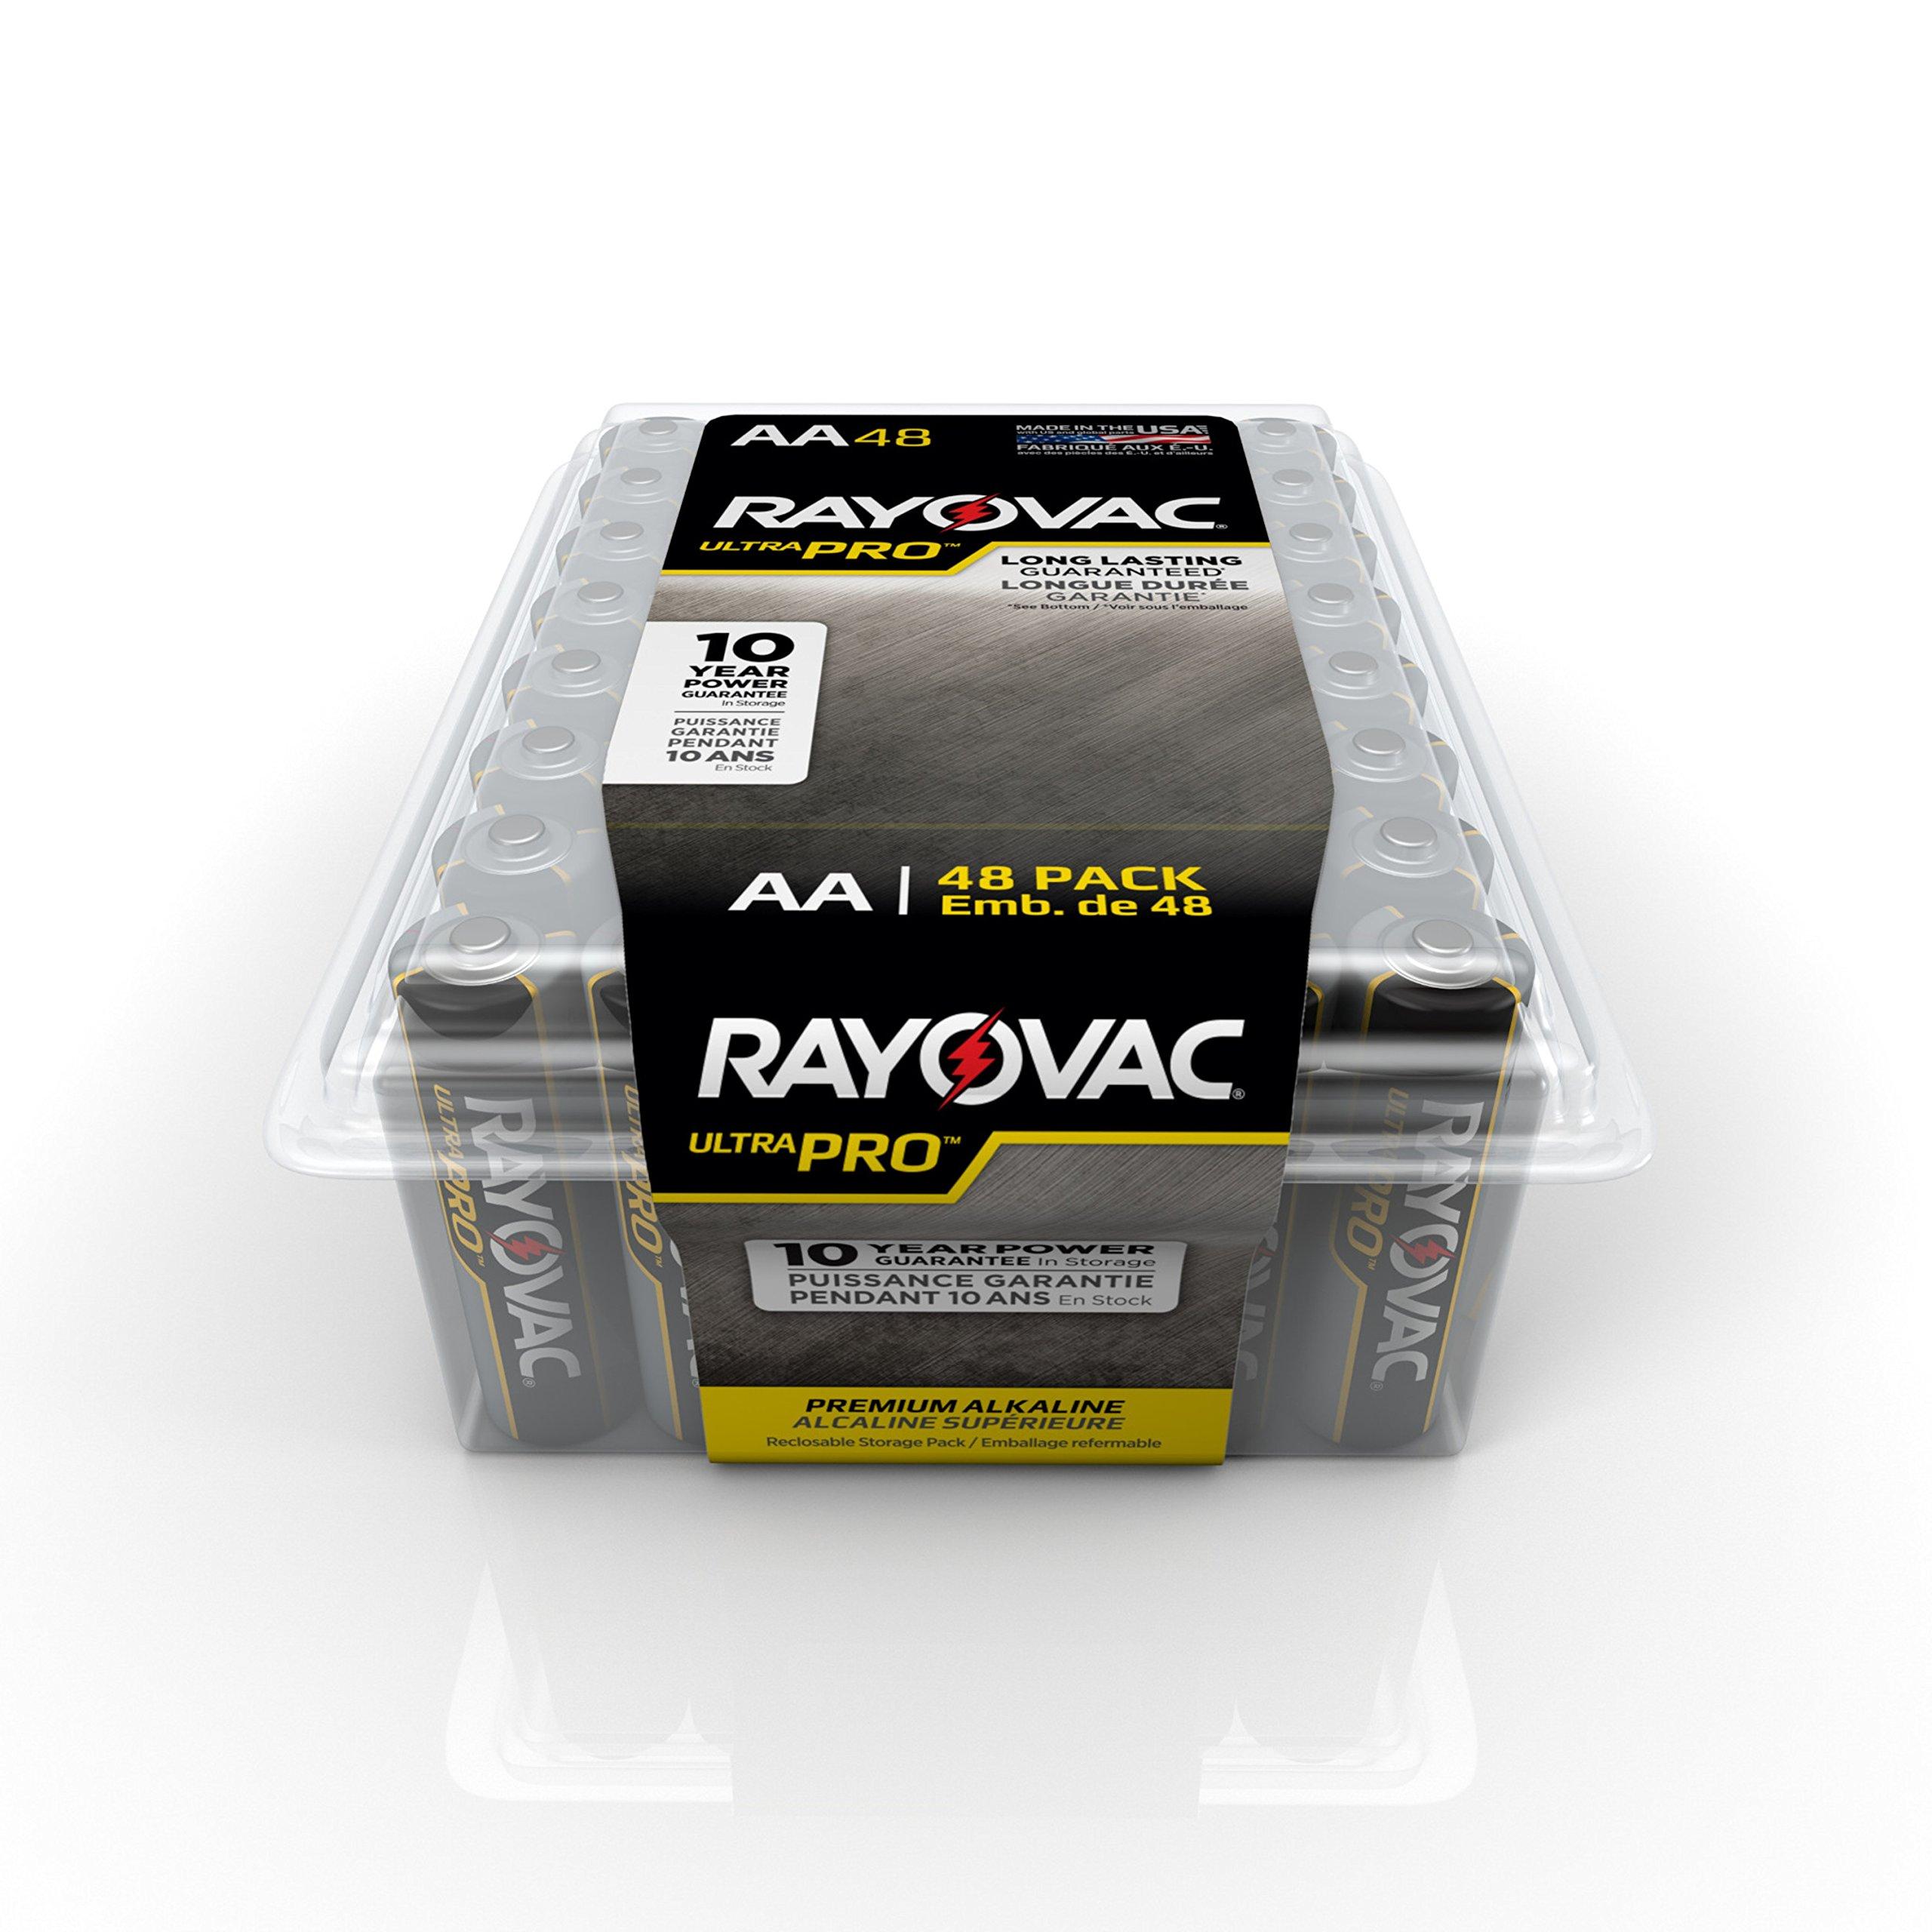 RAYOVAC ALAA-48PPJ Ultra Pro AA Alkaline Batteries, 48-Pack